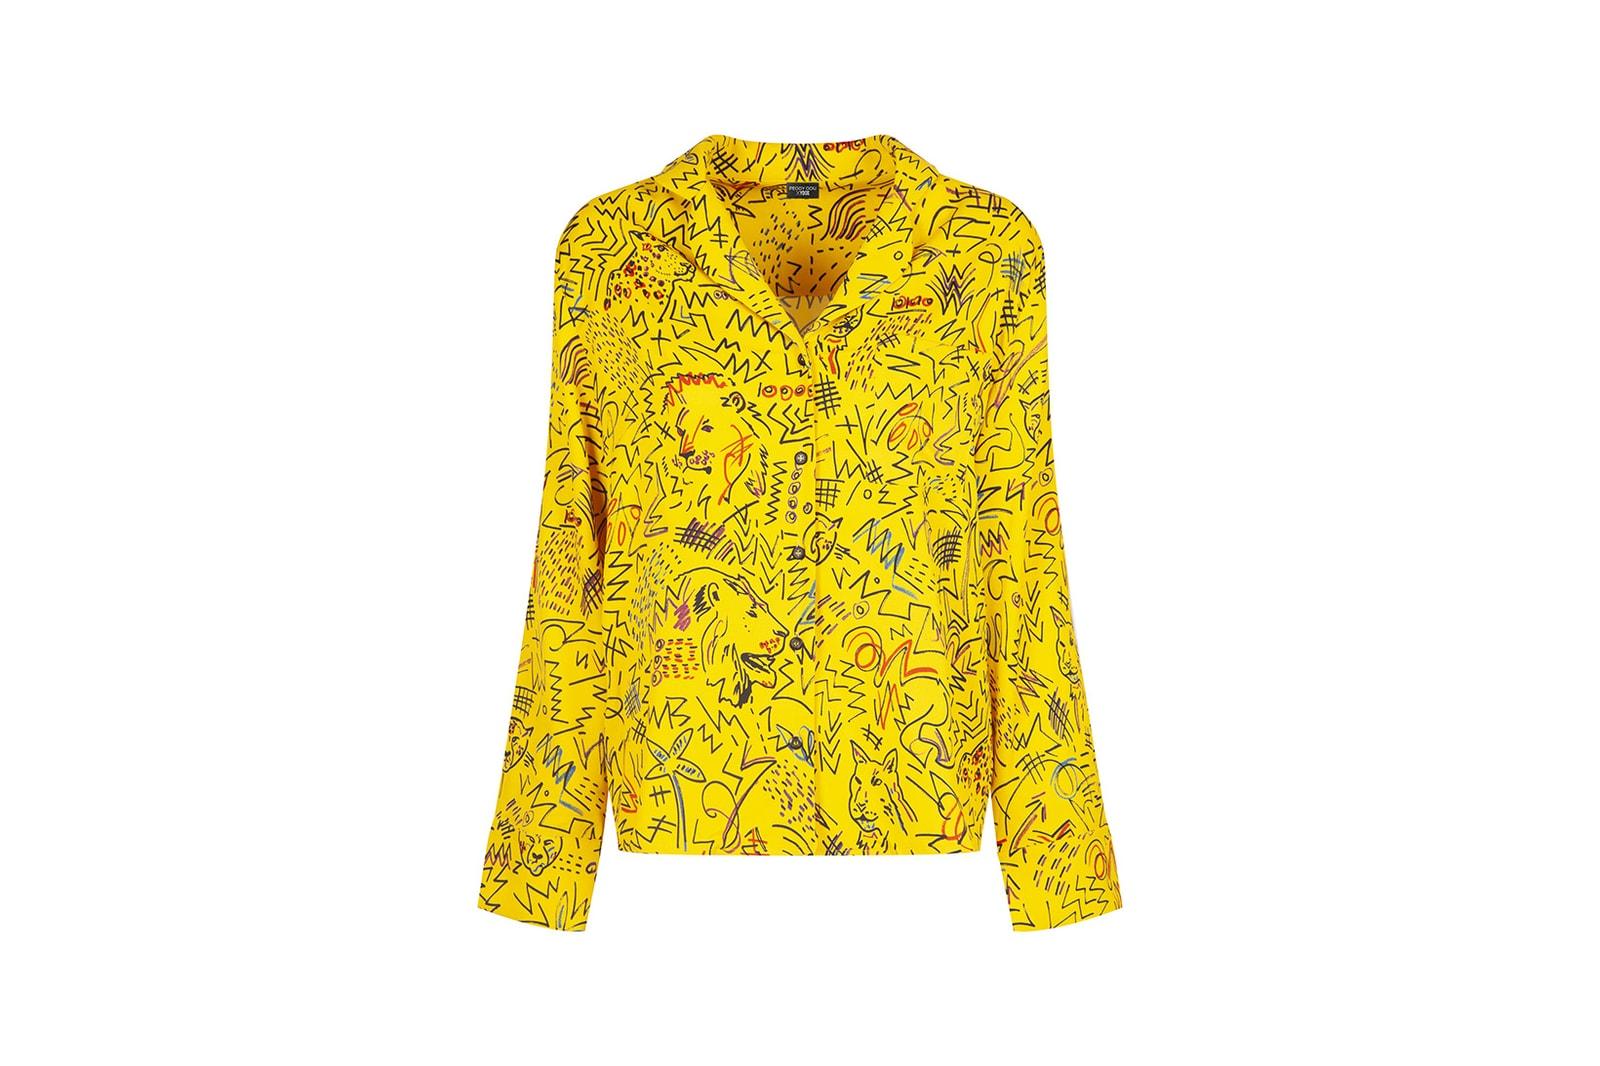 Peggy Gou x YOOX Pajamas Collection